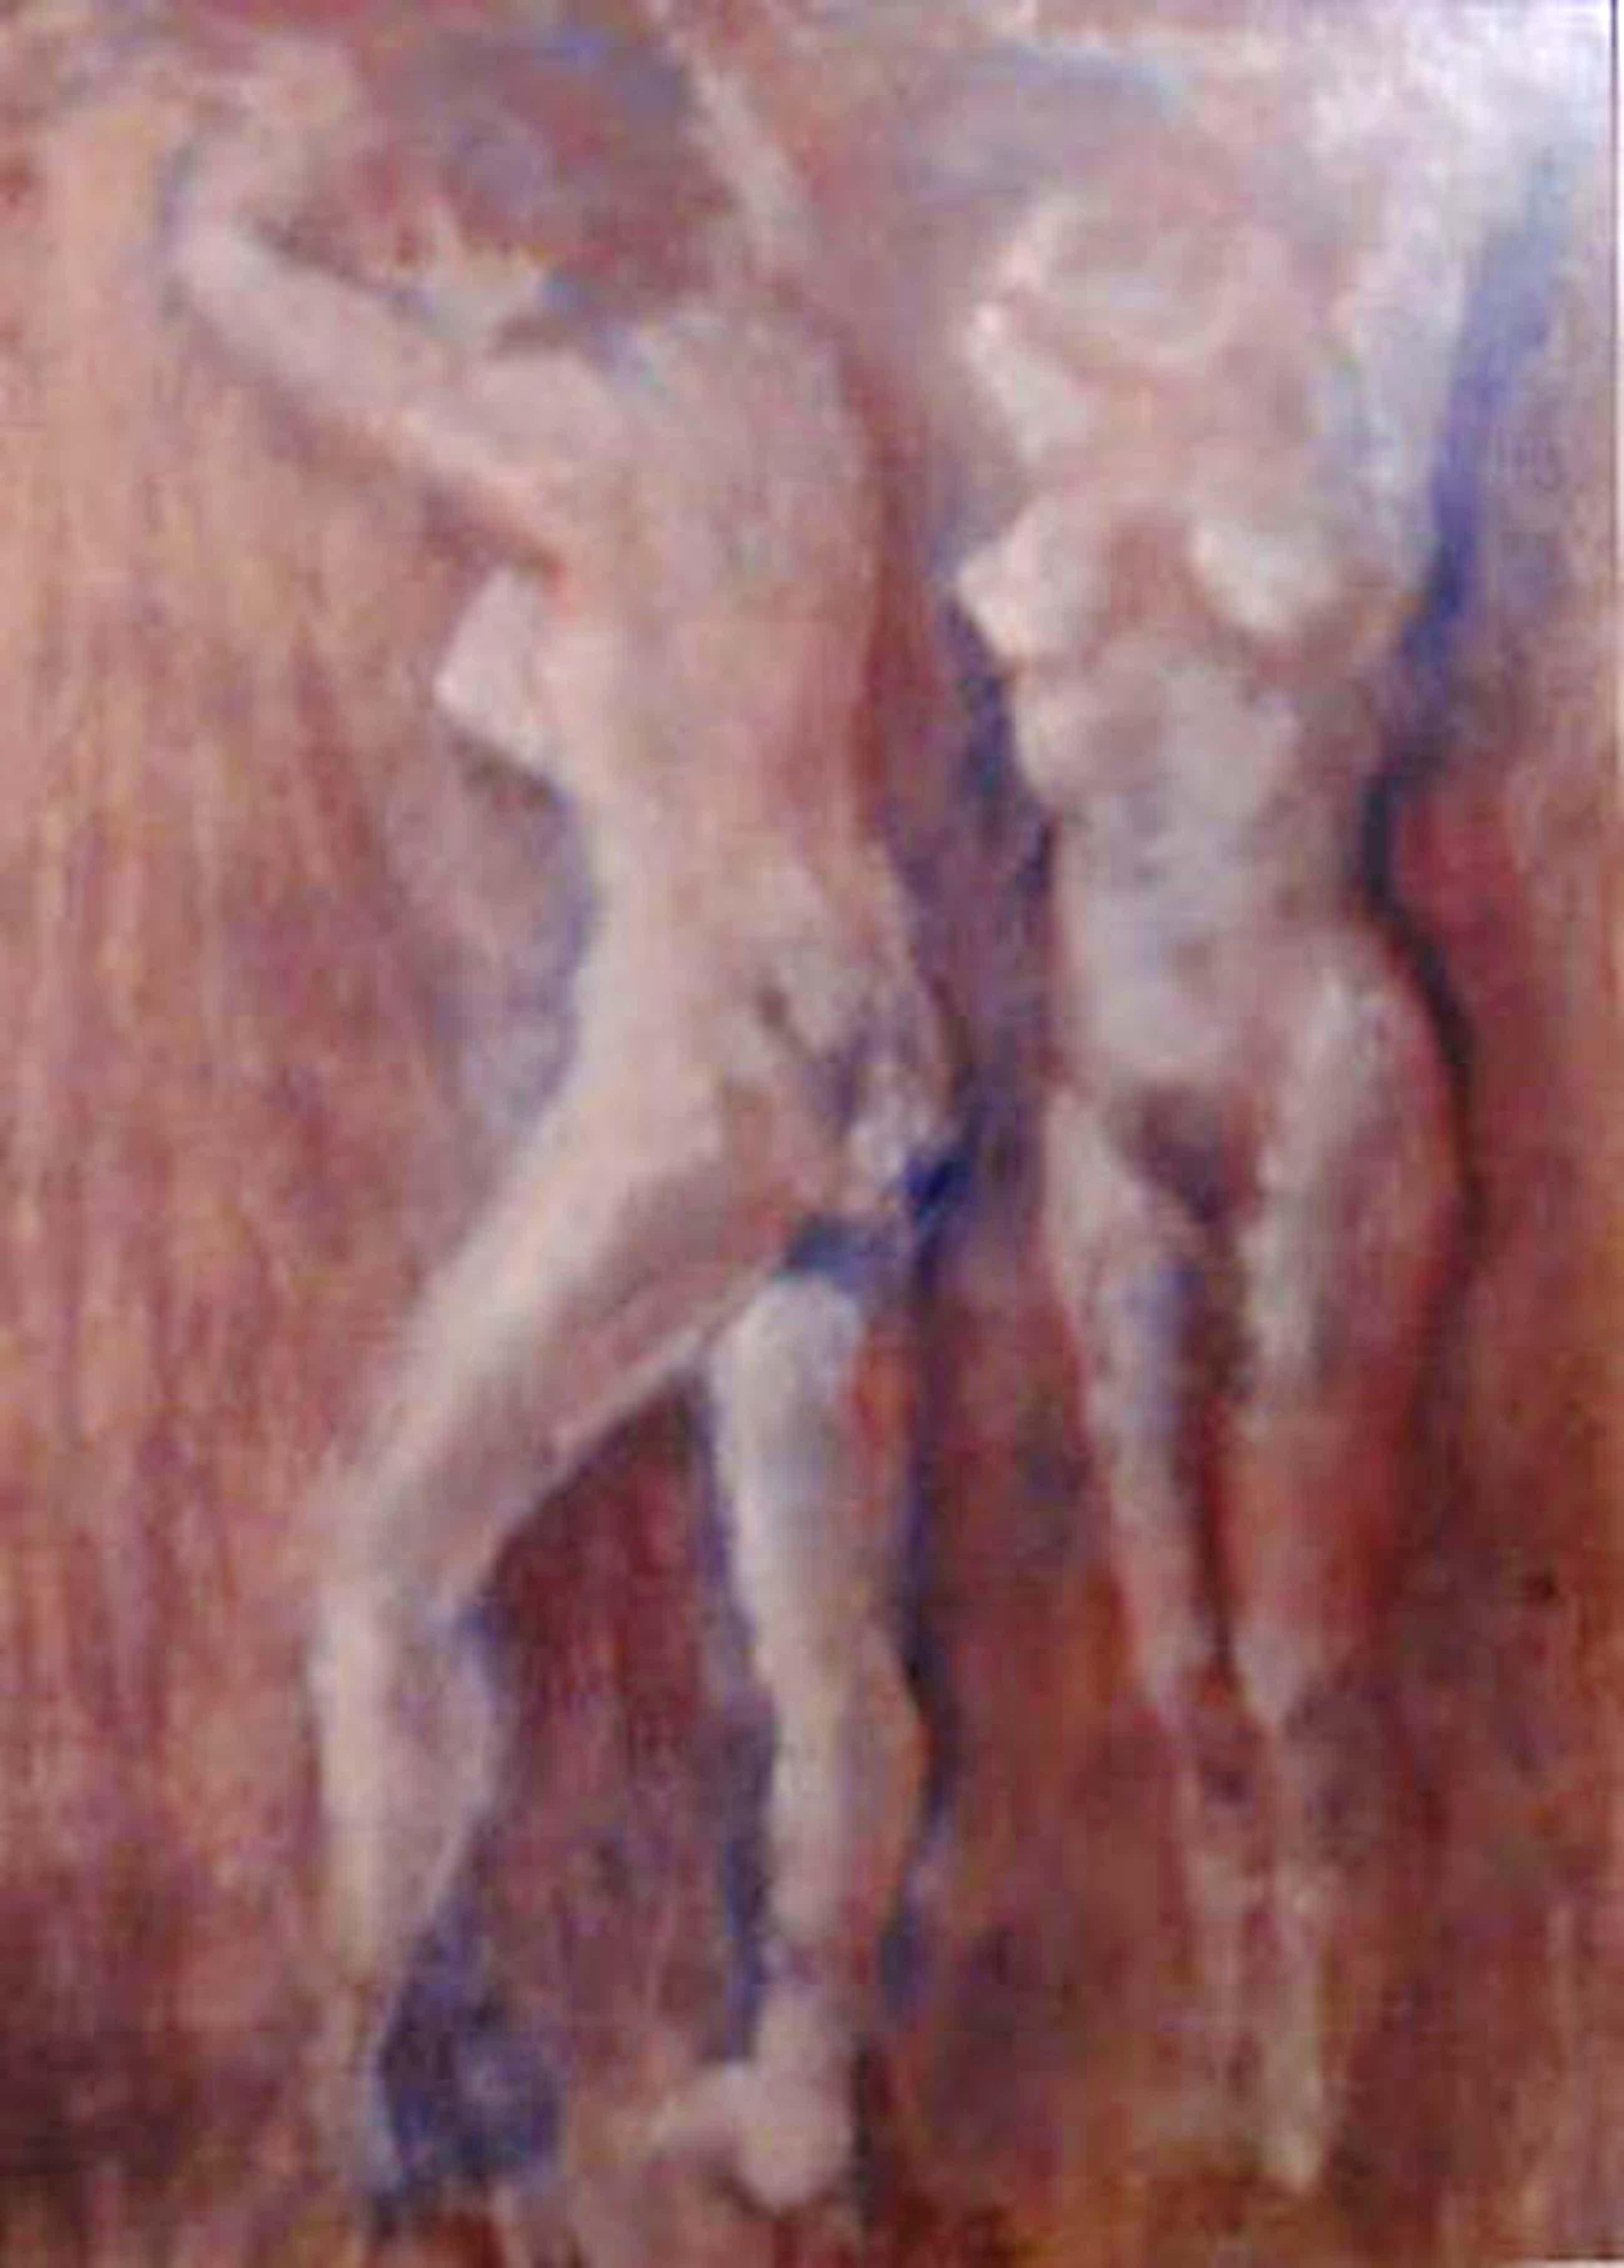 Harry Maas, naaktstudie olie op board, 30 x 40, gesigneerd kopen? Bied vanaf 50!